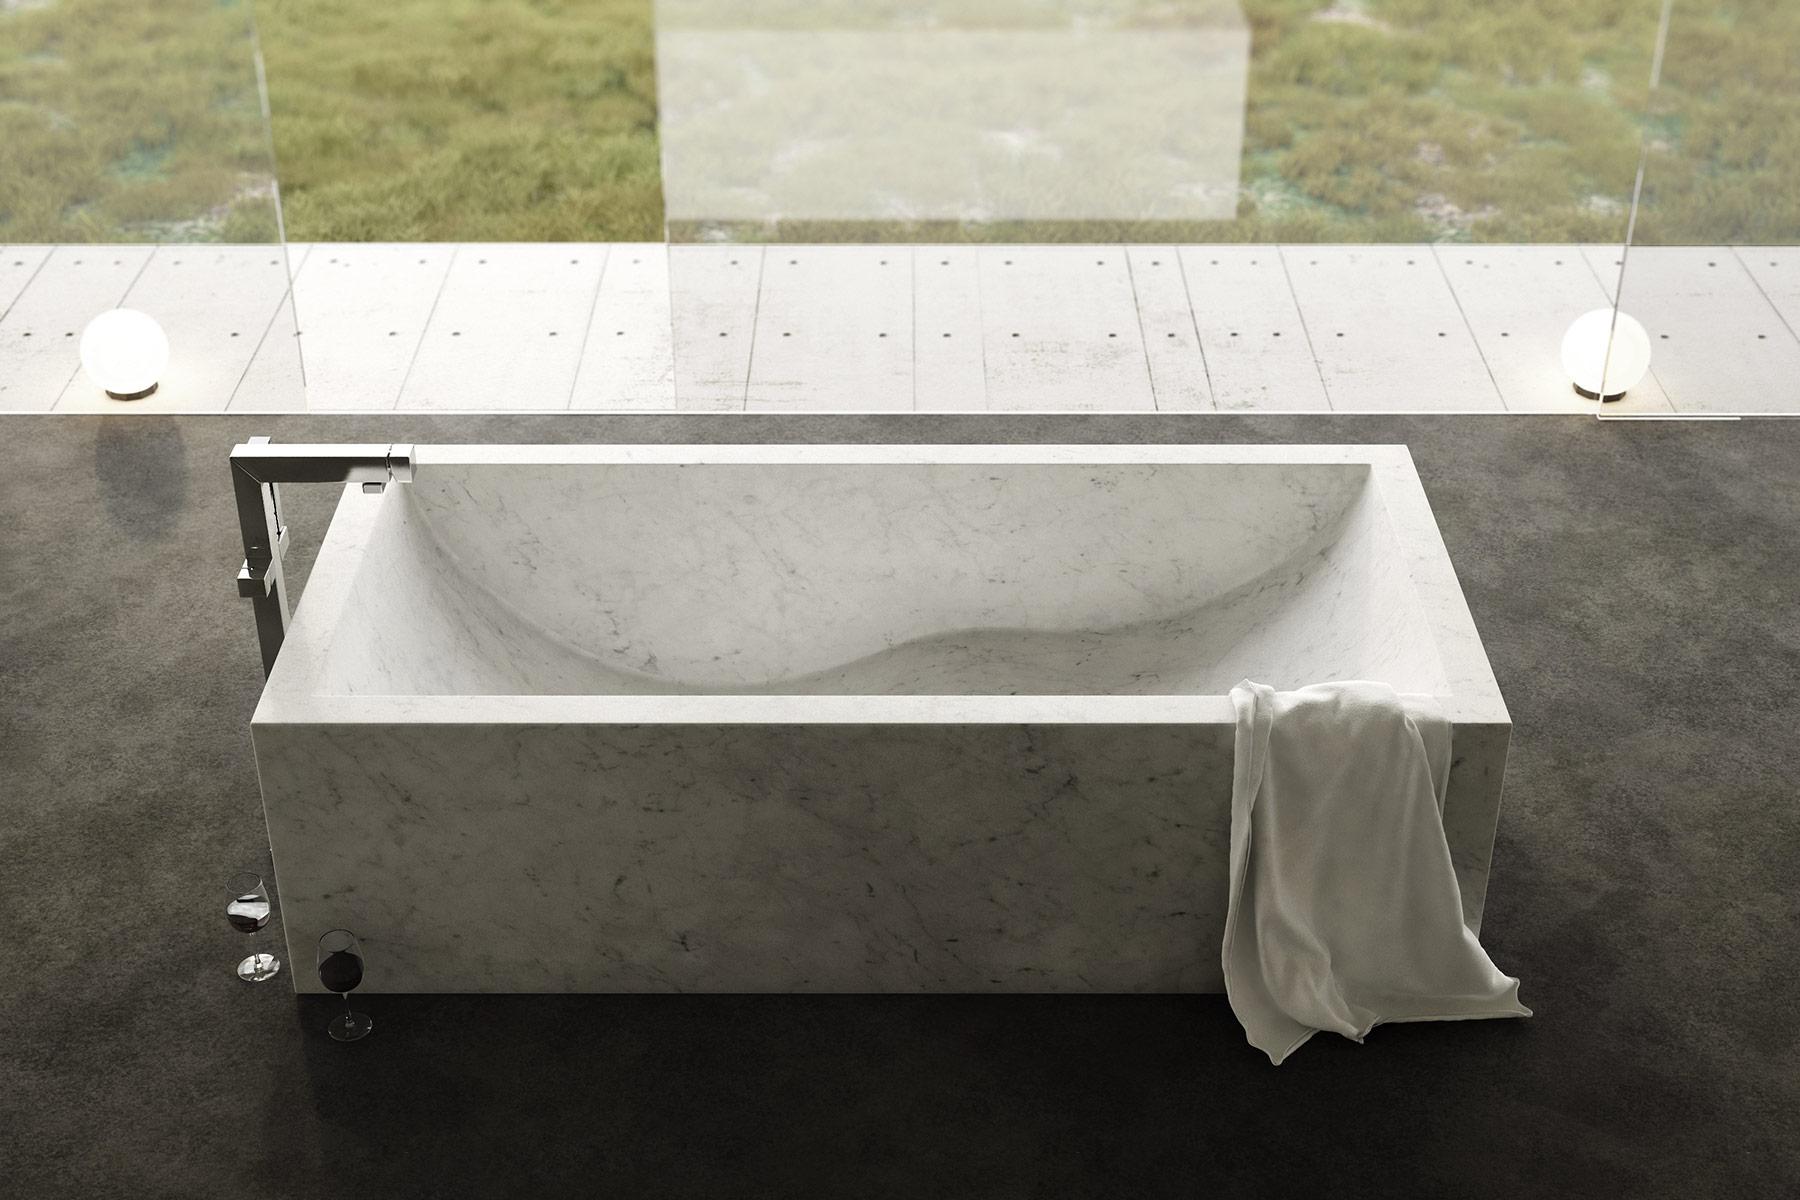 Modern Onda Freestanding Bathtub